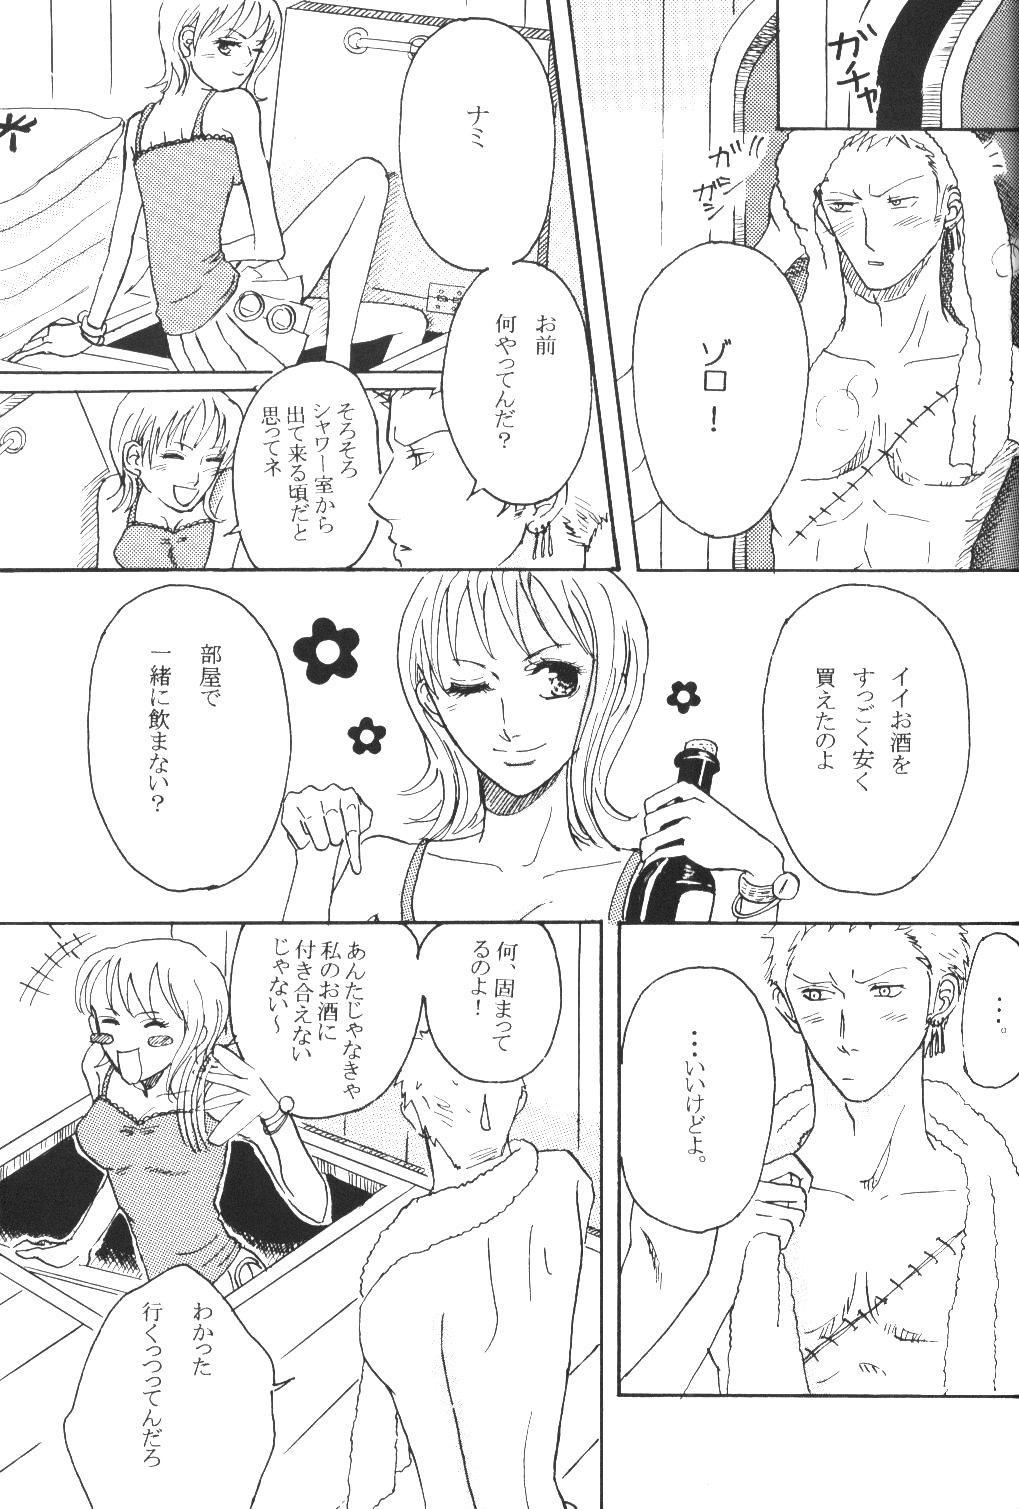 Yume Ichiya 2 5